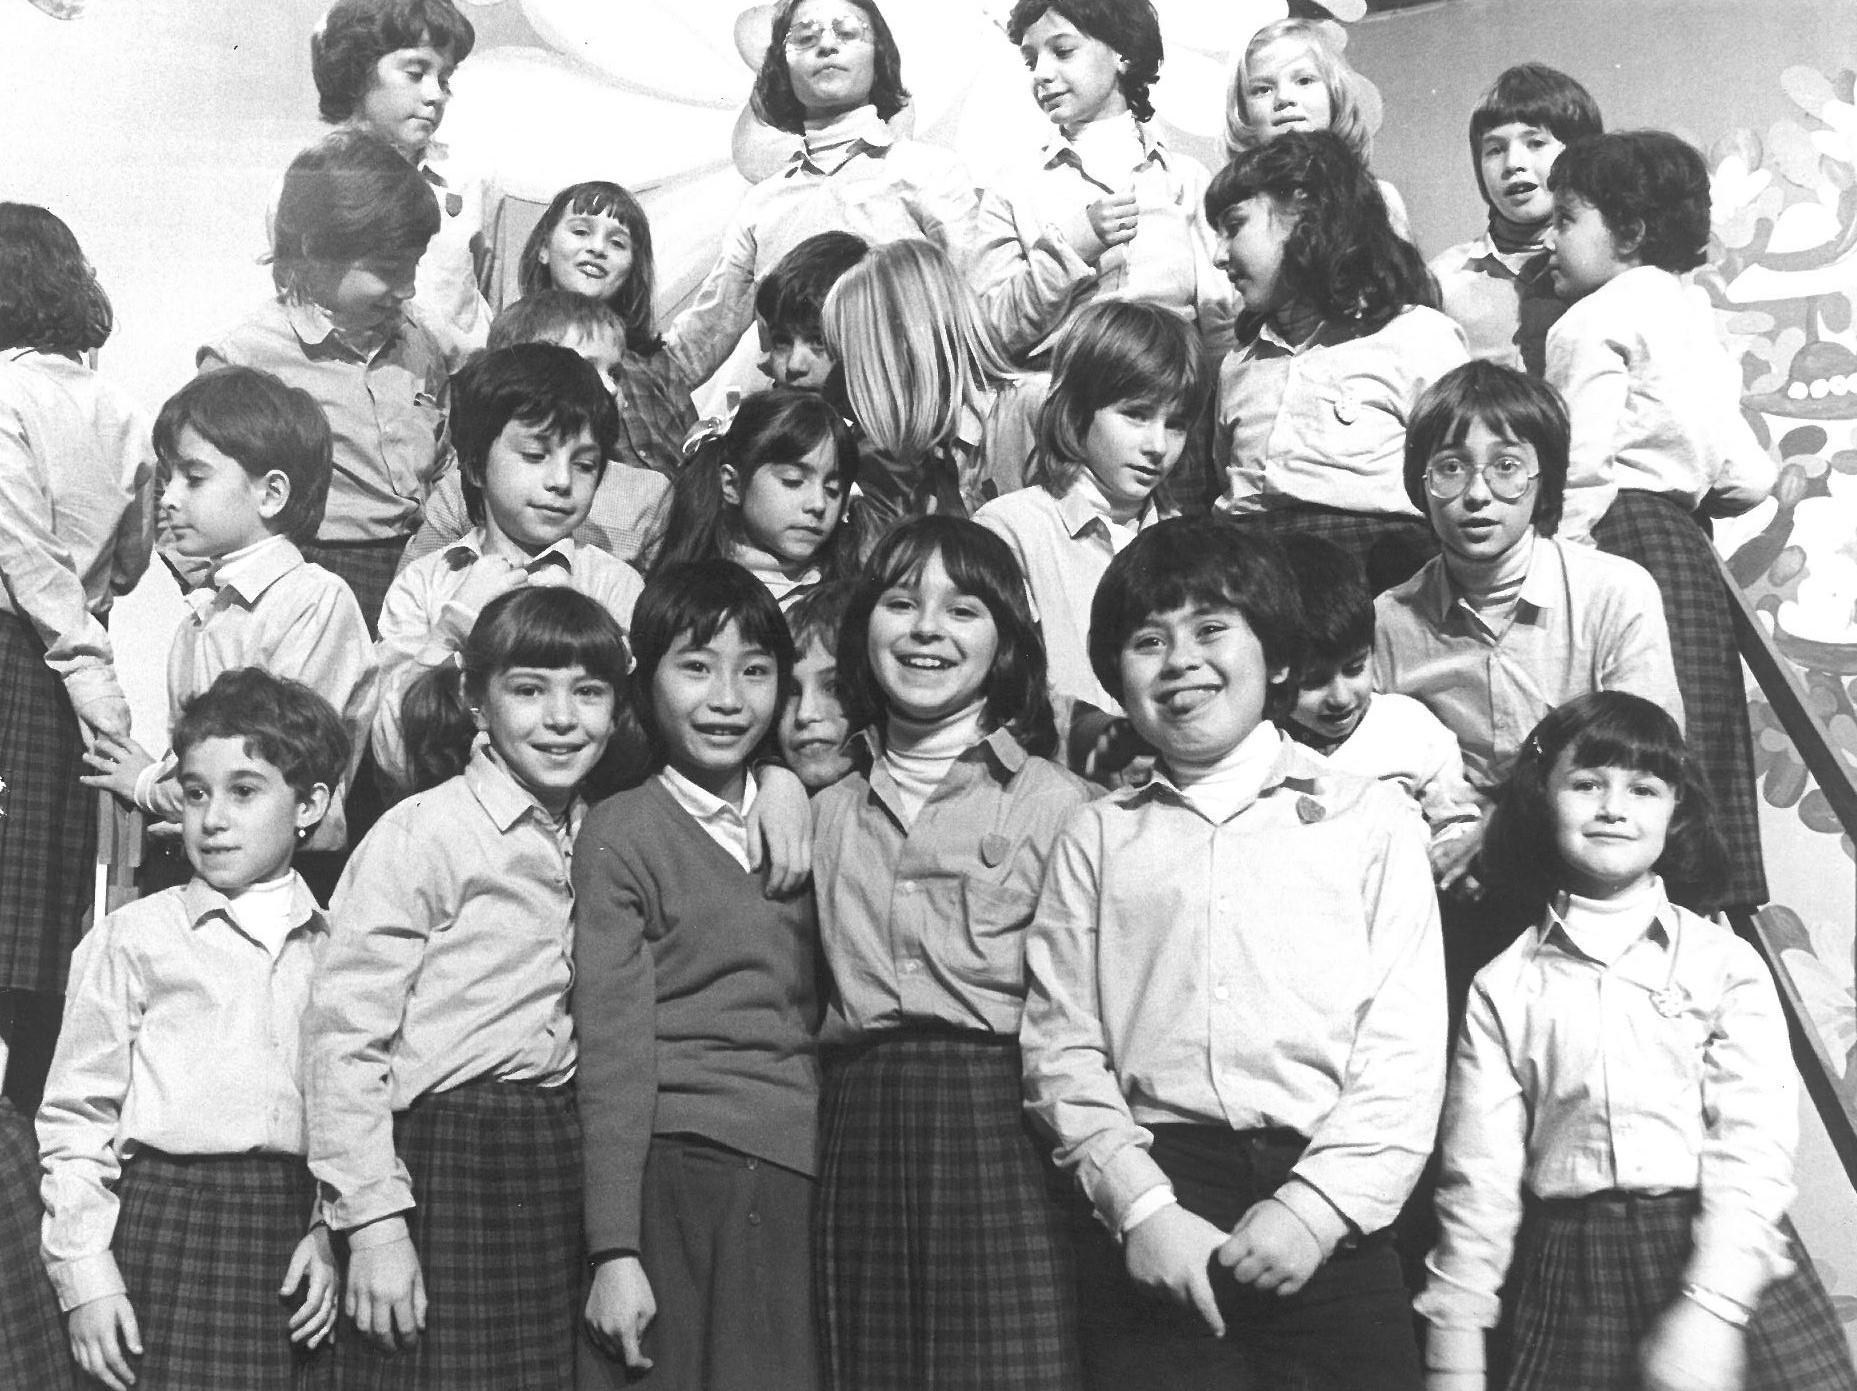 1980 - 1